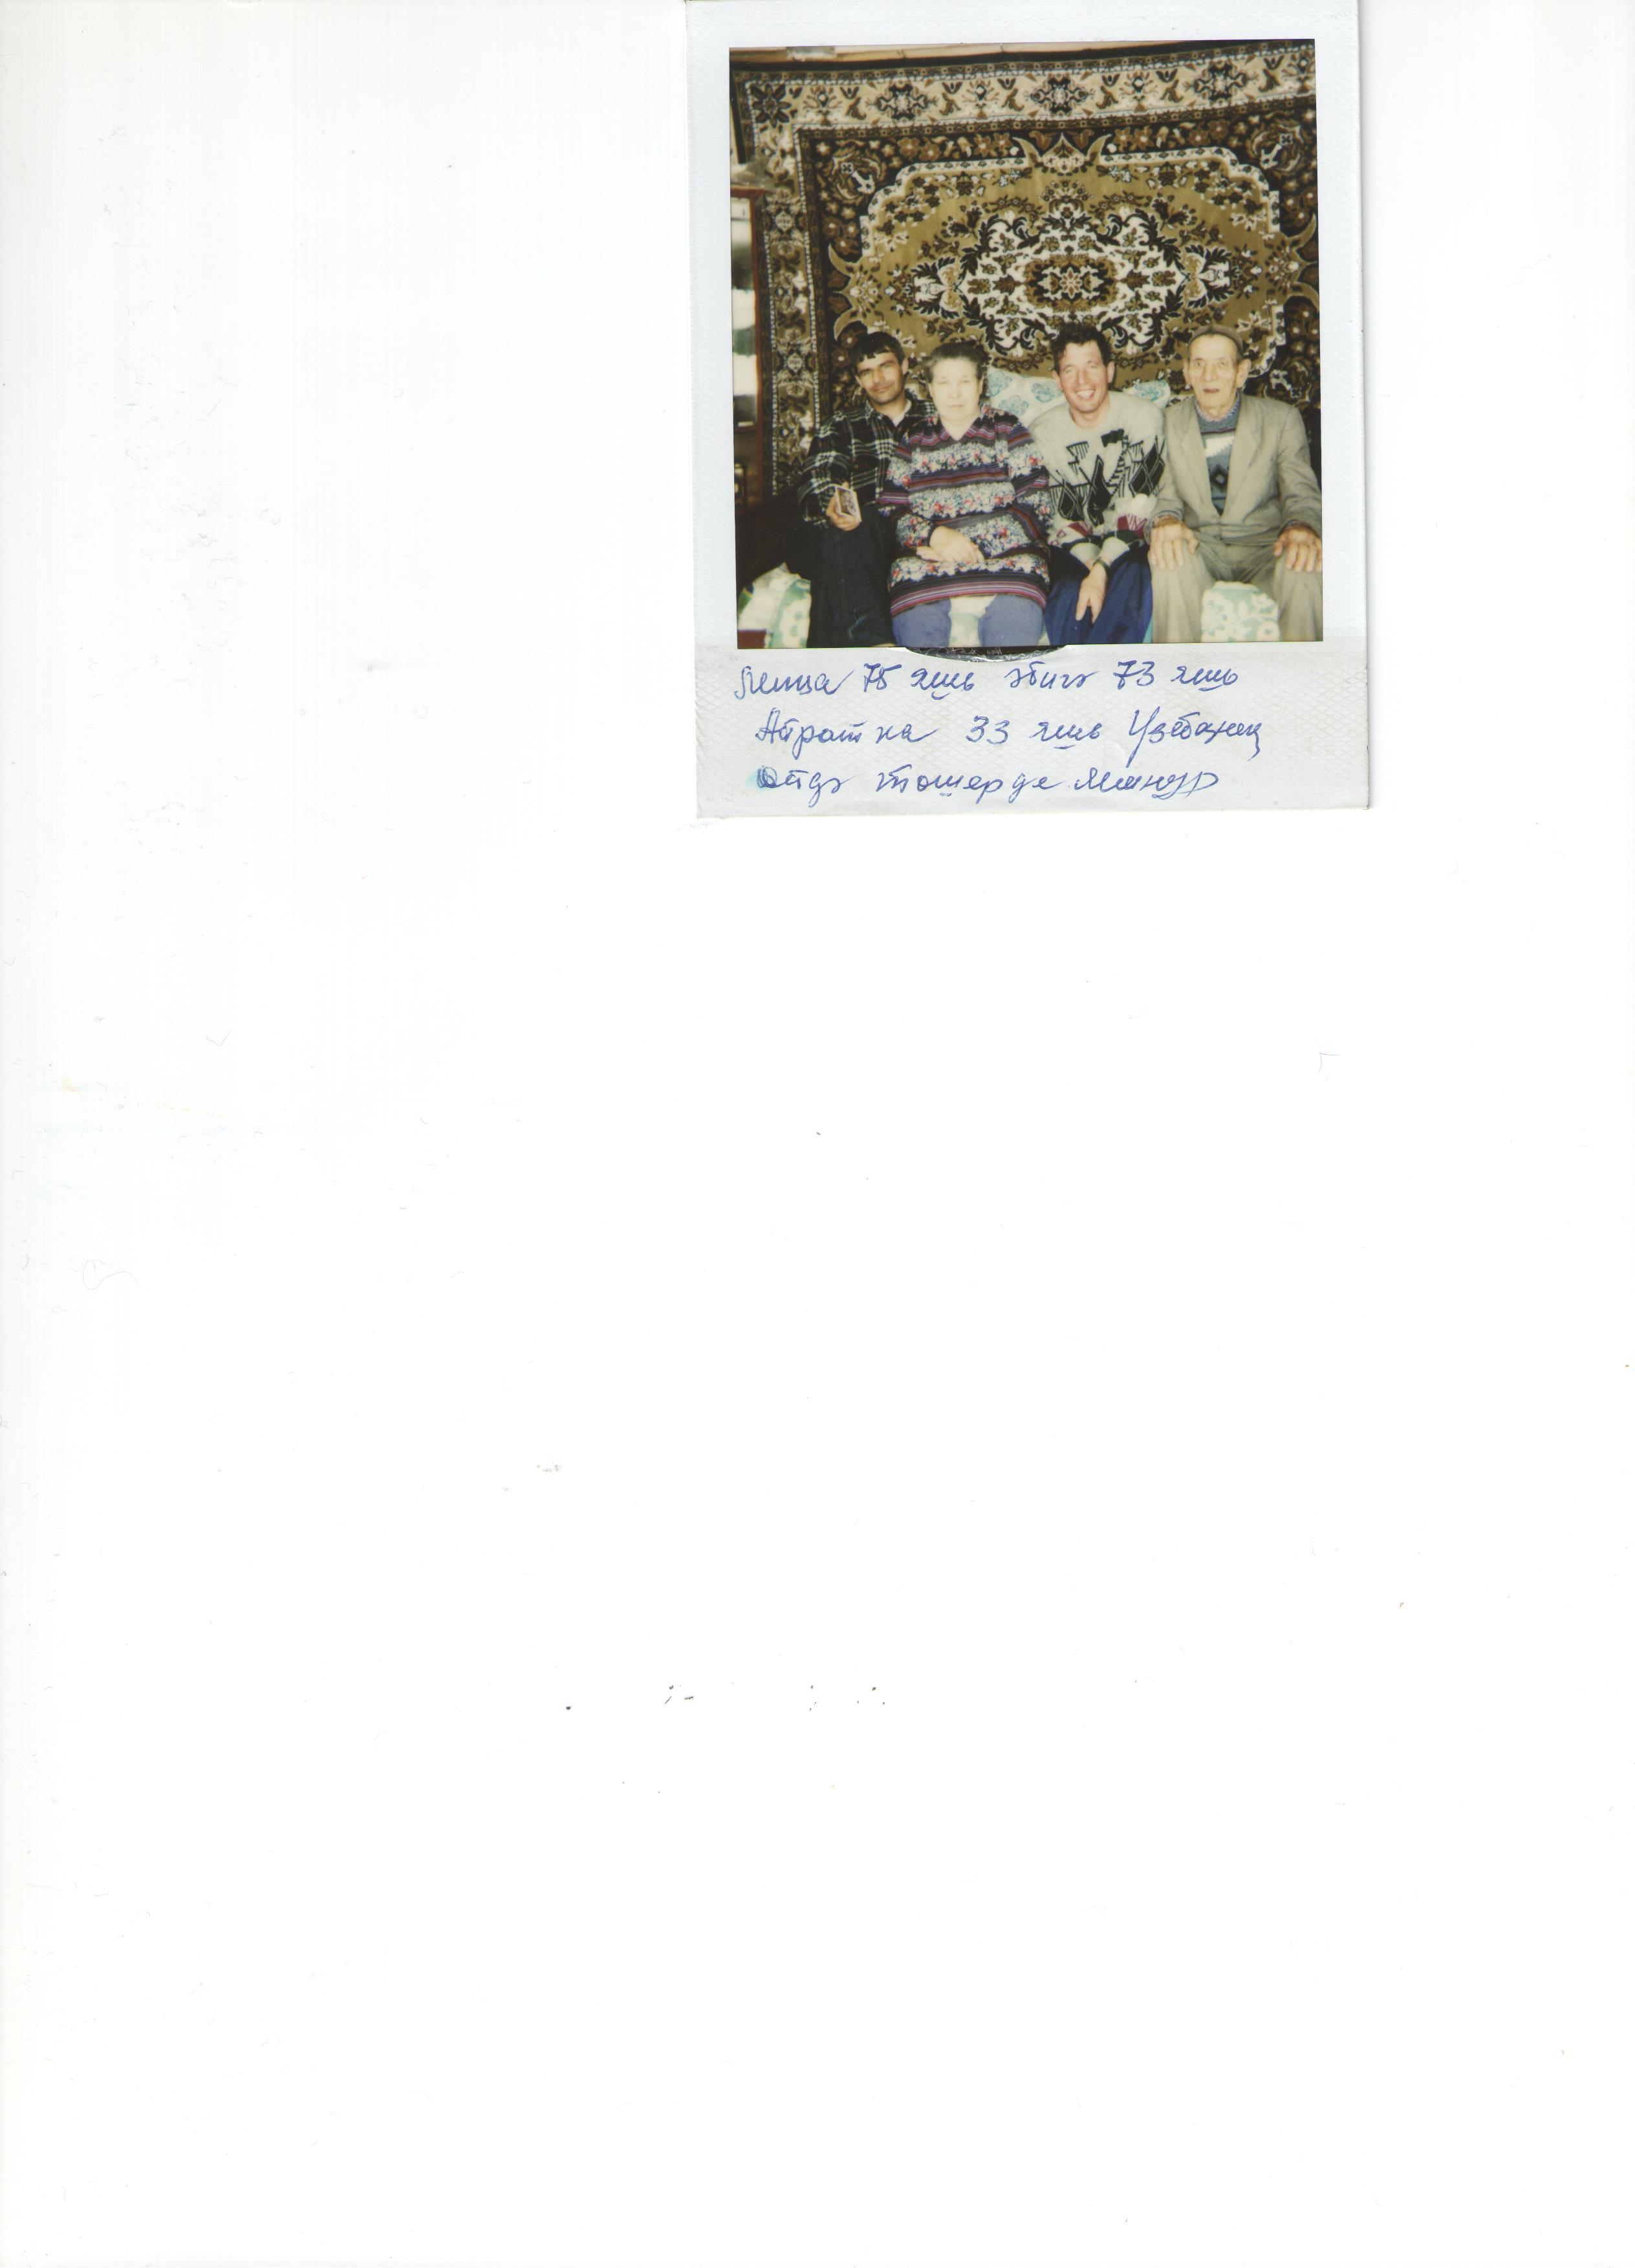 C:\Users\1978\Documents\Scanned Documents\Рисунок (17).jpg